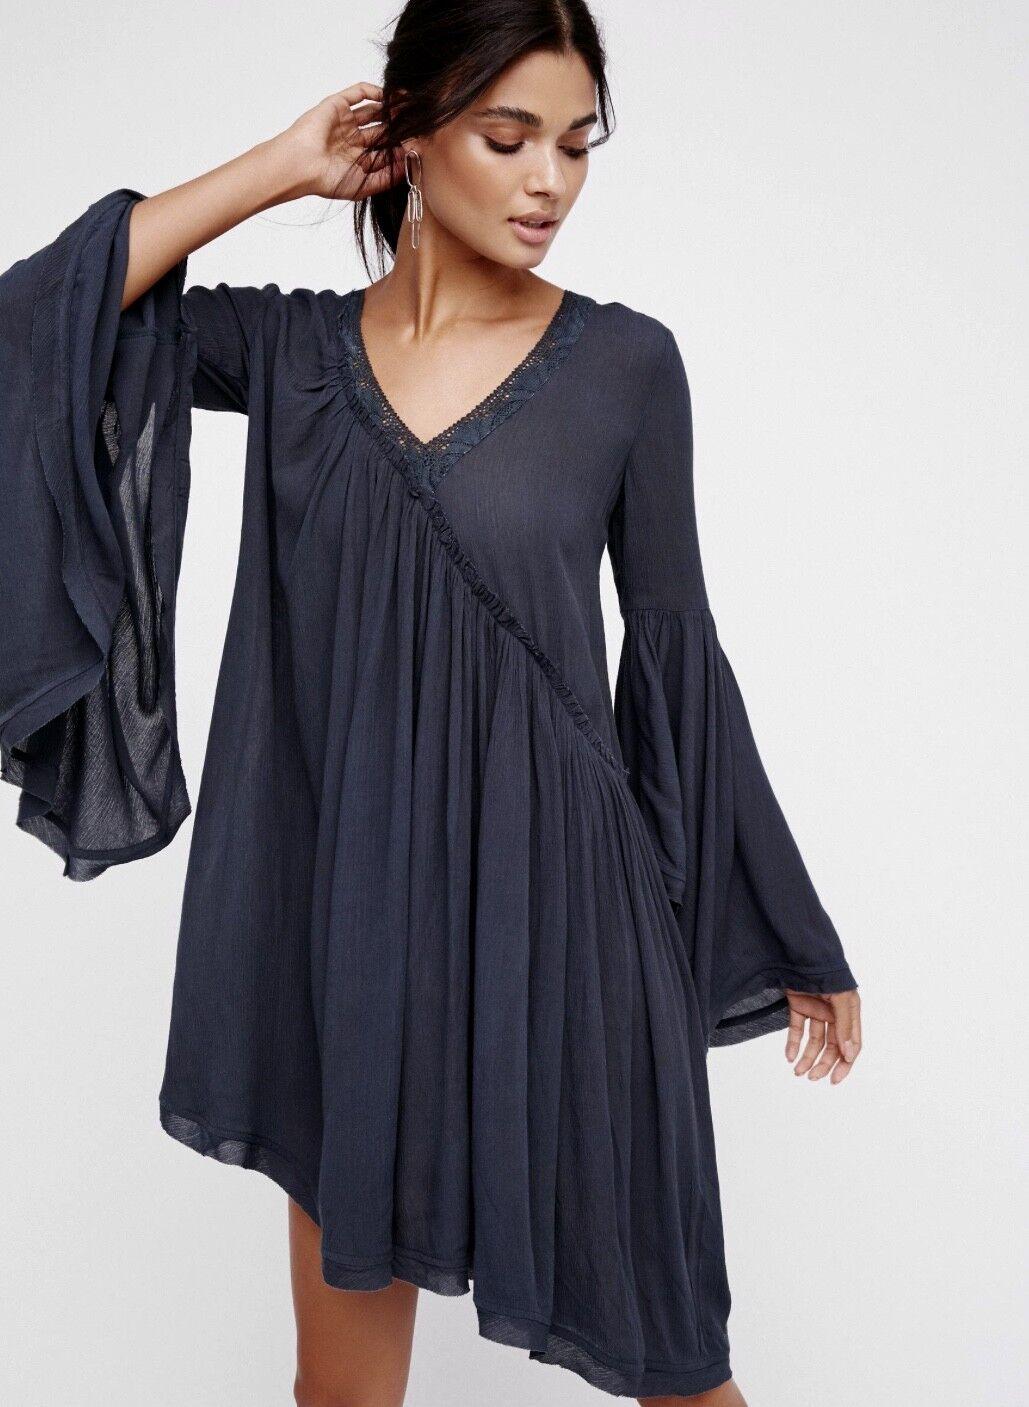 a5d190ca NEW Free People dark bluee Oversize Lace Asymmetrical Midi Swing Tunic Dress  S